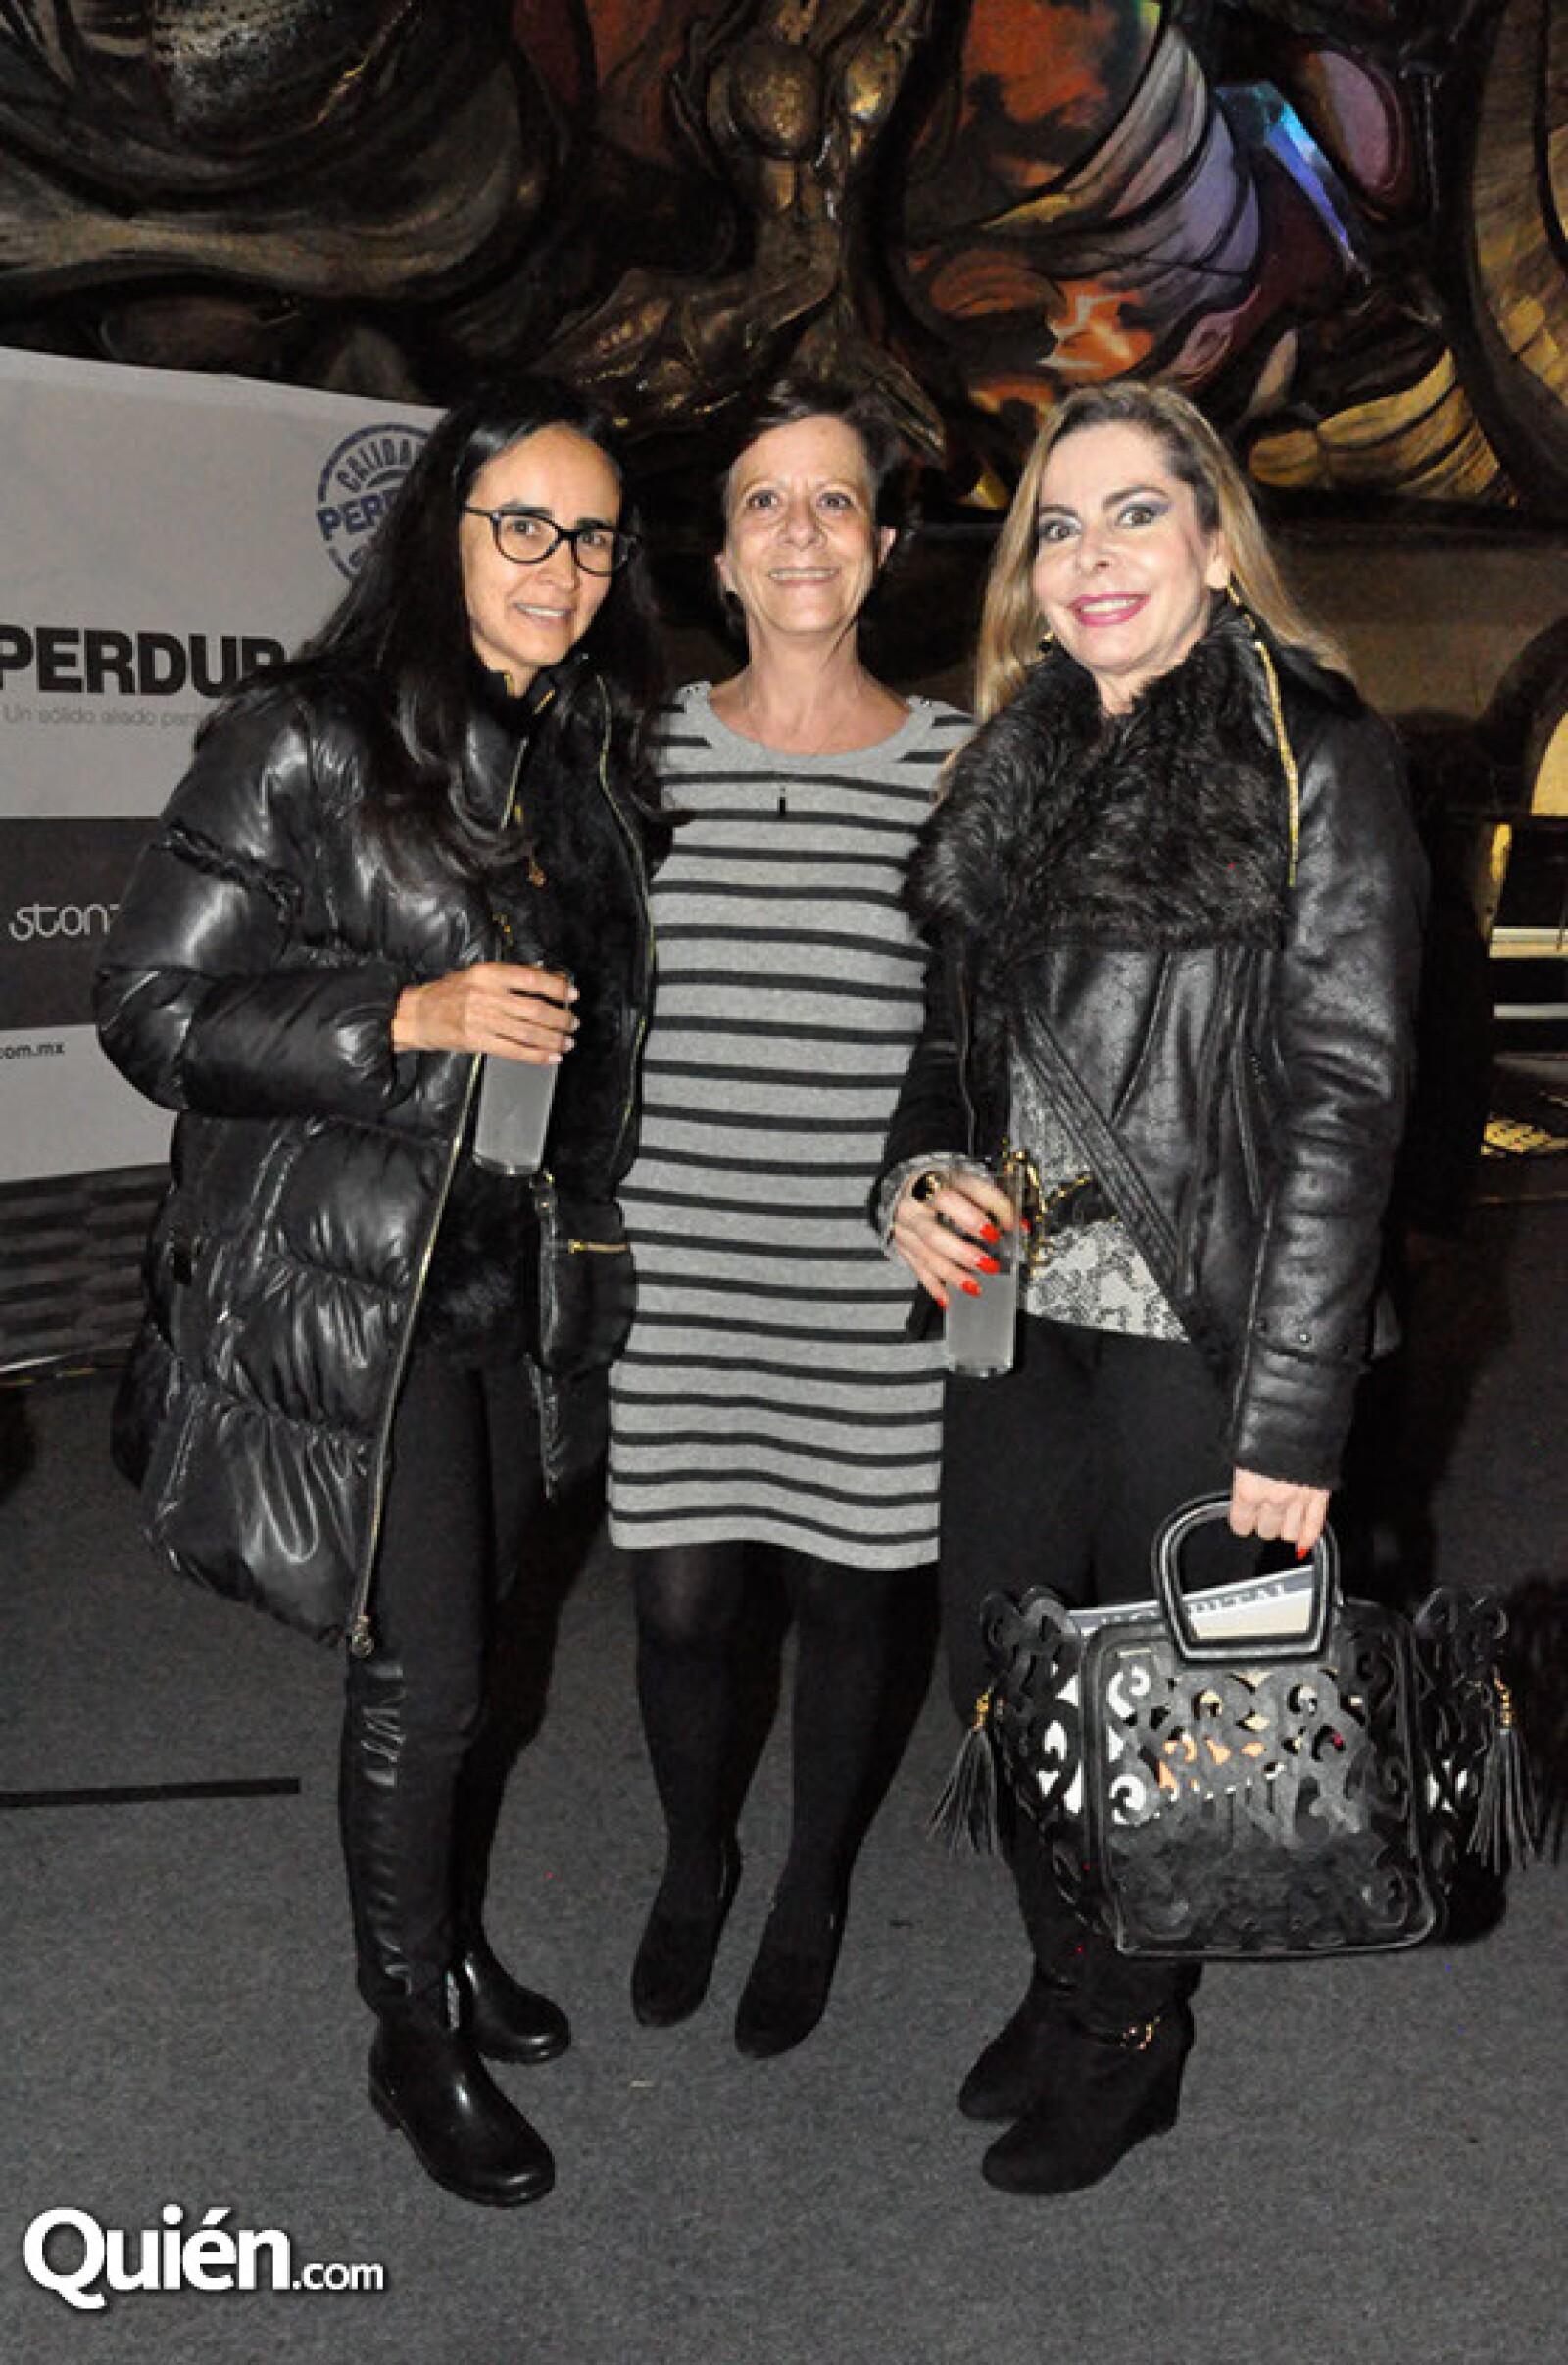 Mónica Pantoja,Lurdes Fernández y Cristina Ruiz